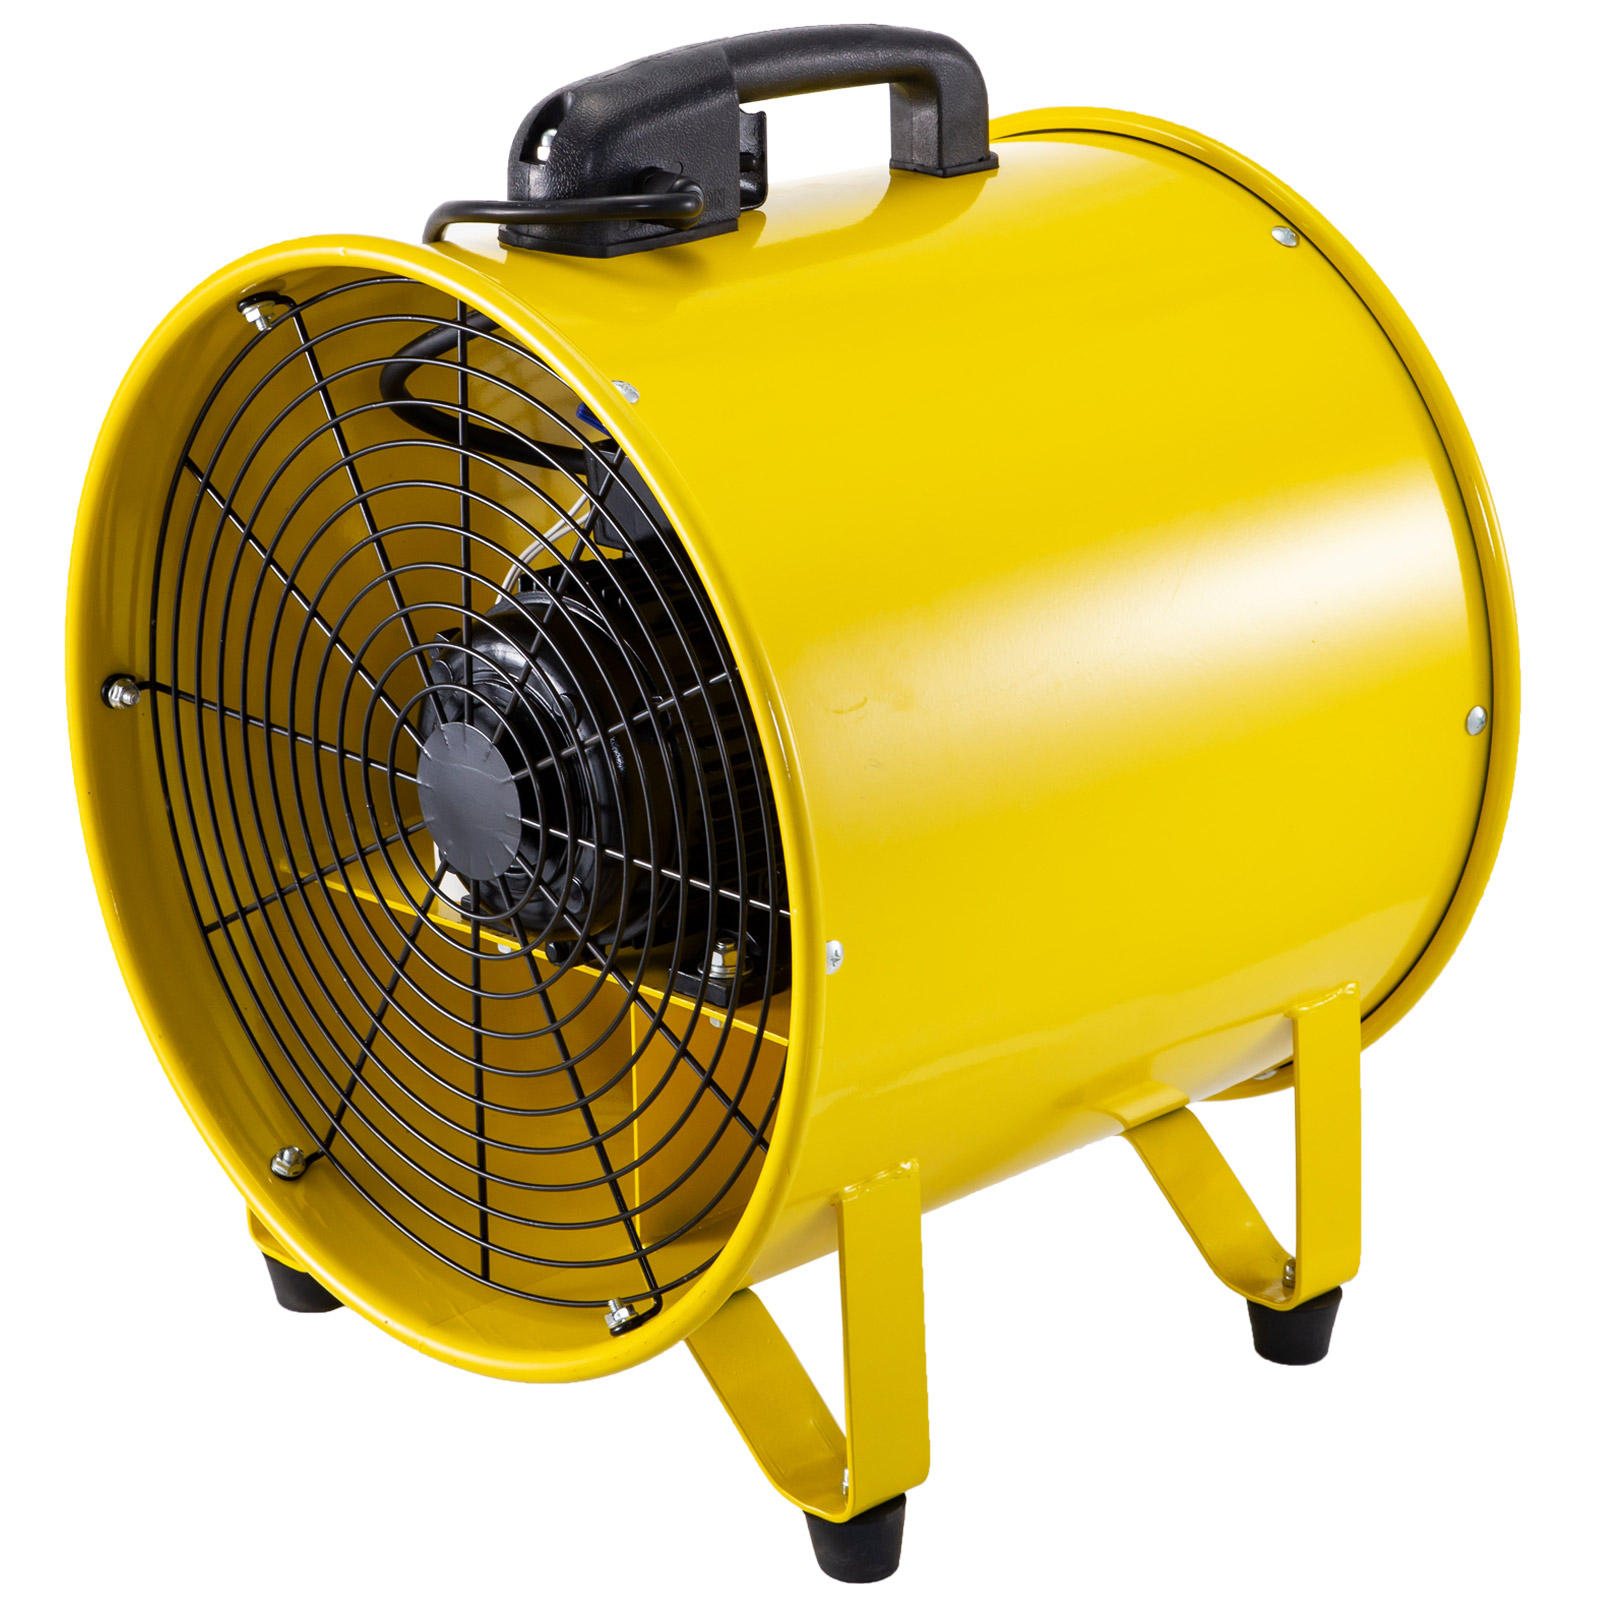 "Portable Ventilator Portable Ventilation Fan 16"" Utility ..."